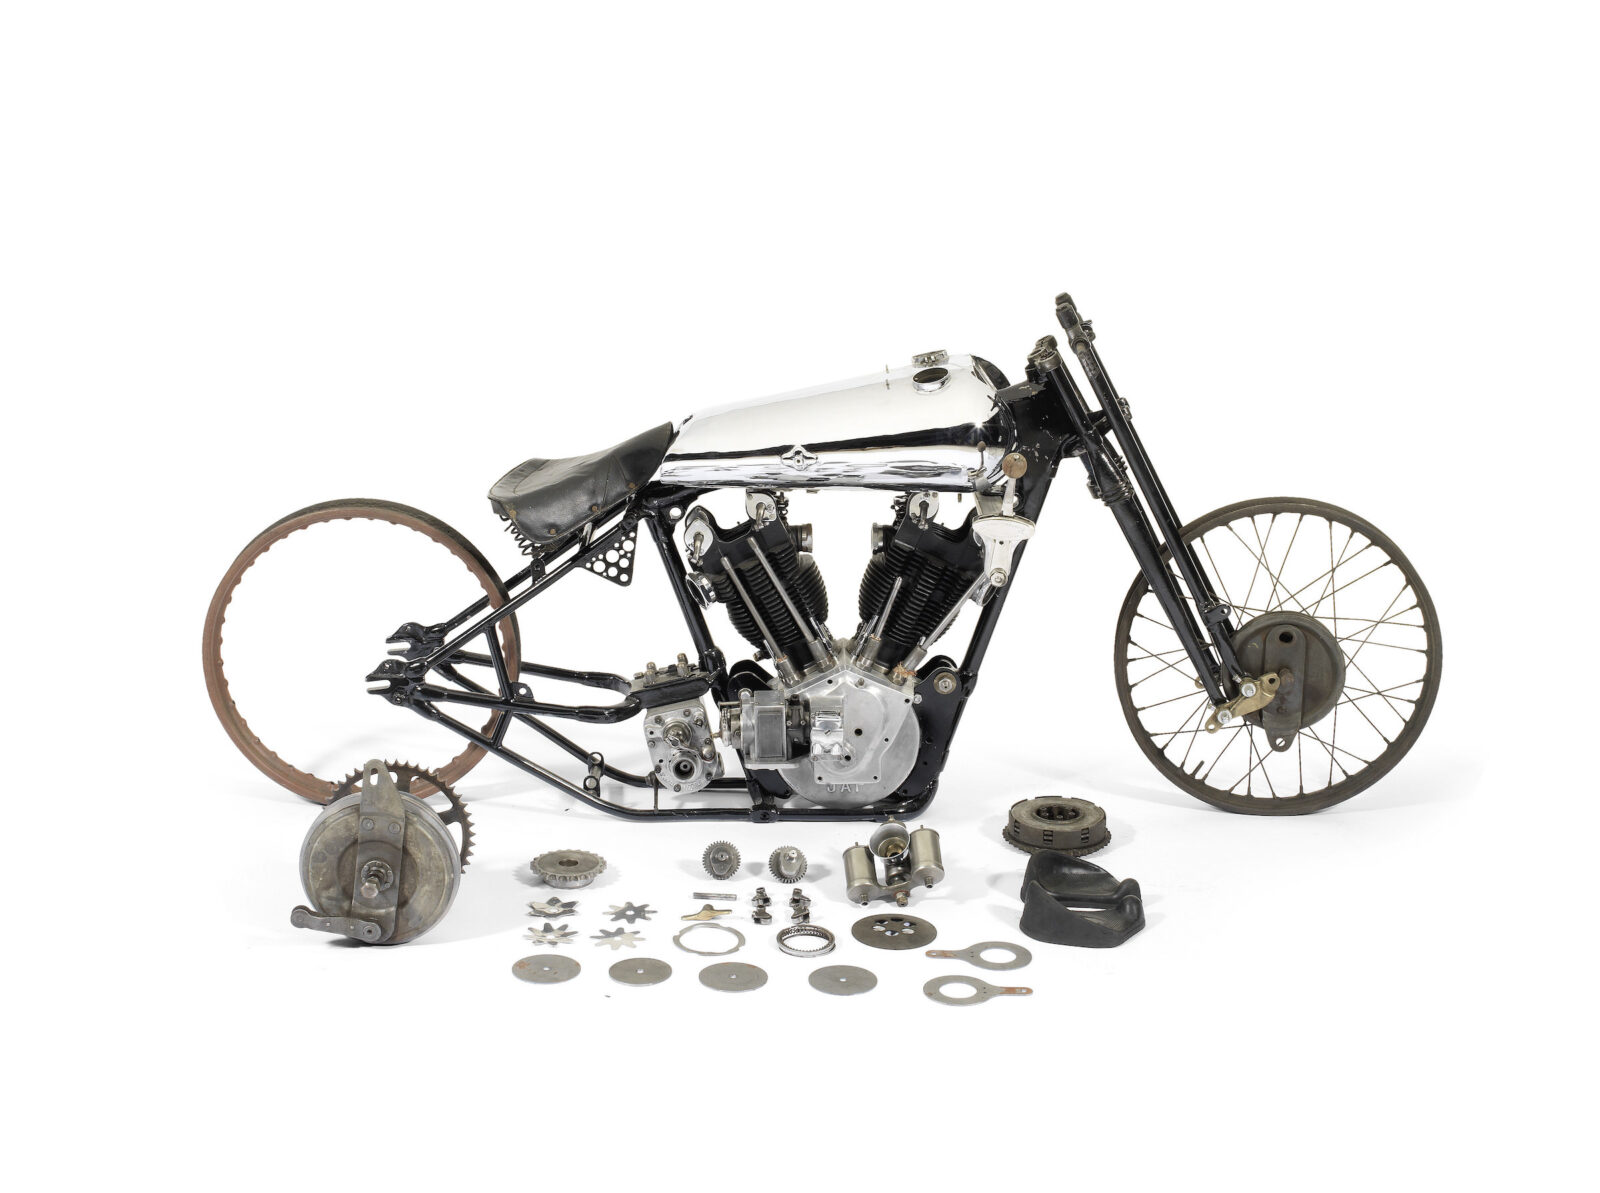 Brough Superior SS100 Pendine Project Bike 1600x1193 - $100,000 Project Bike: 1929 Brough Superior SS100 Pendine